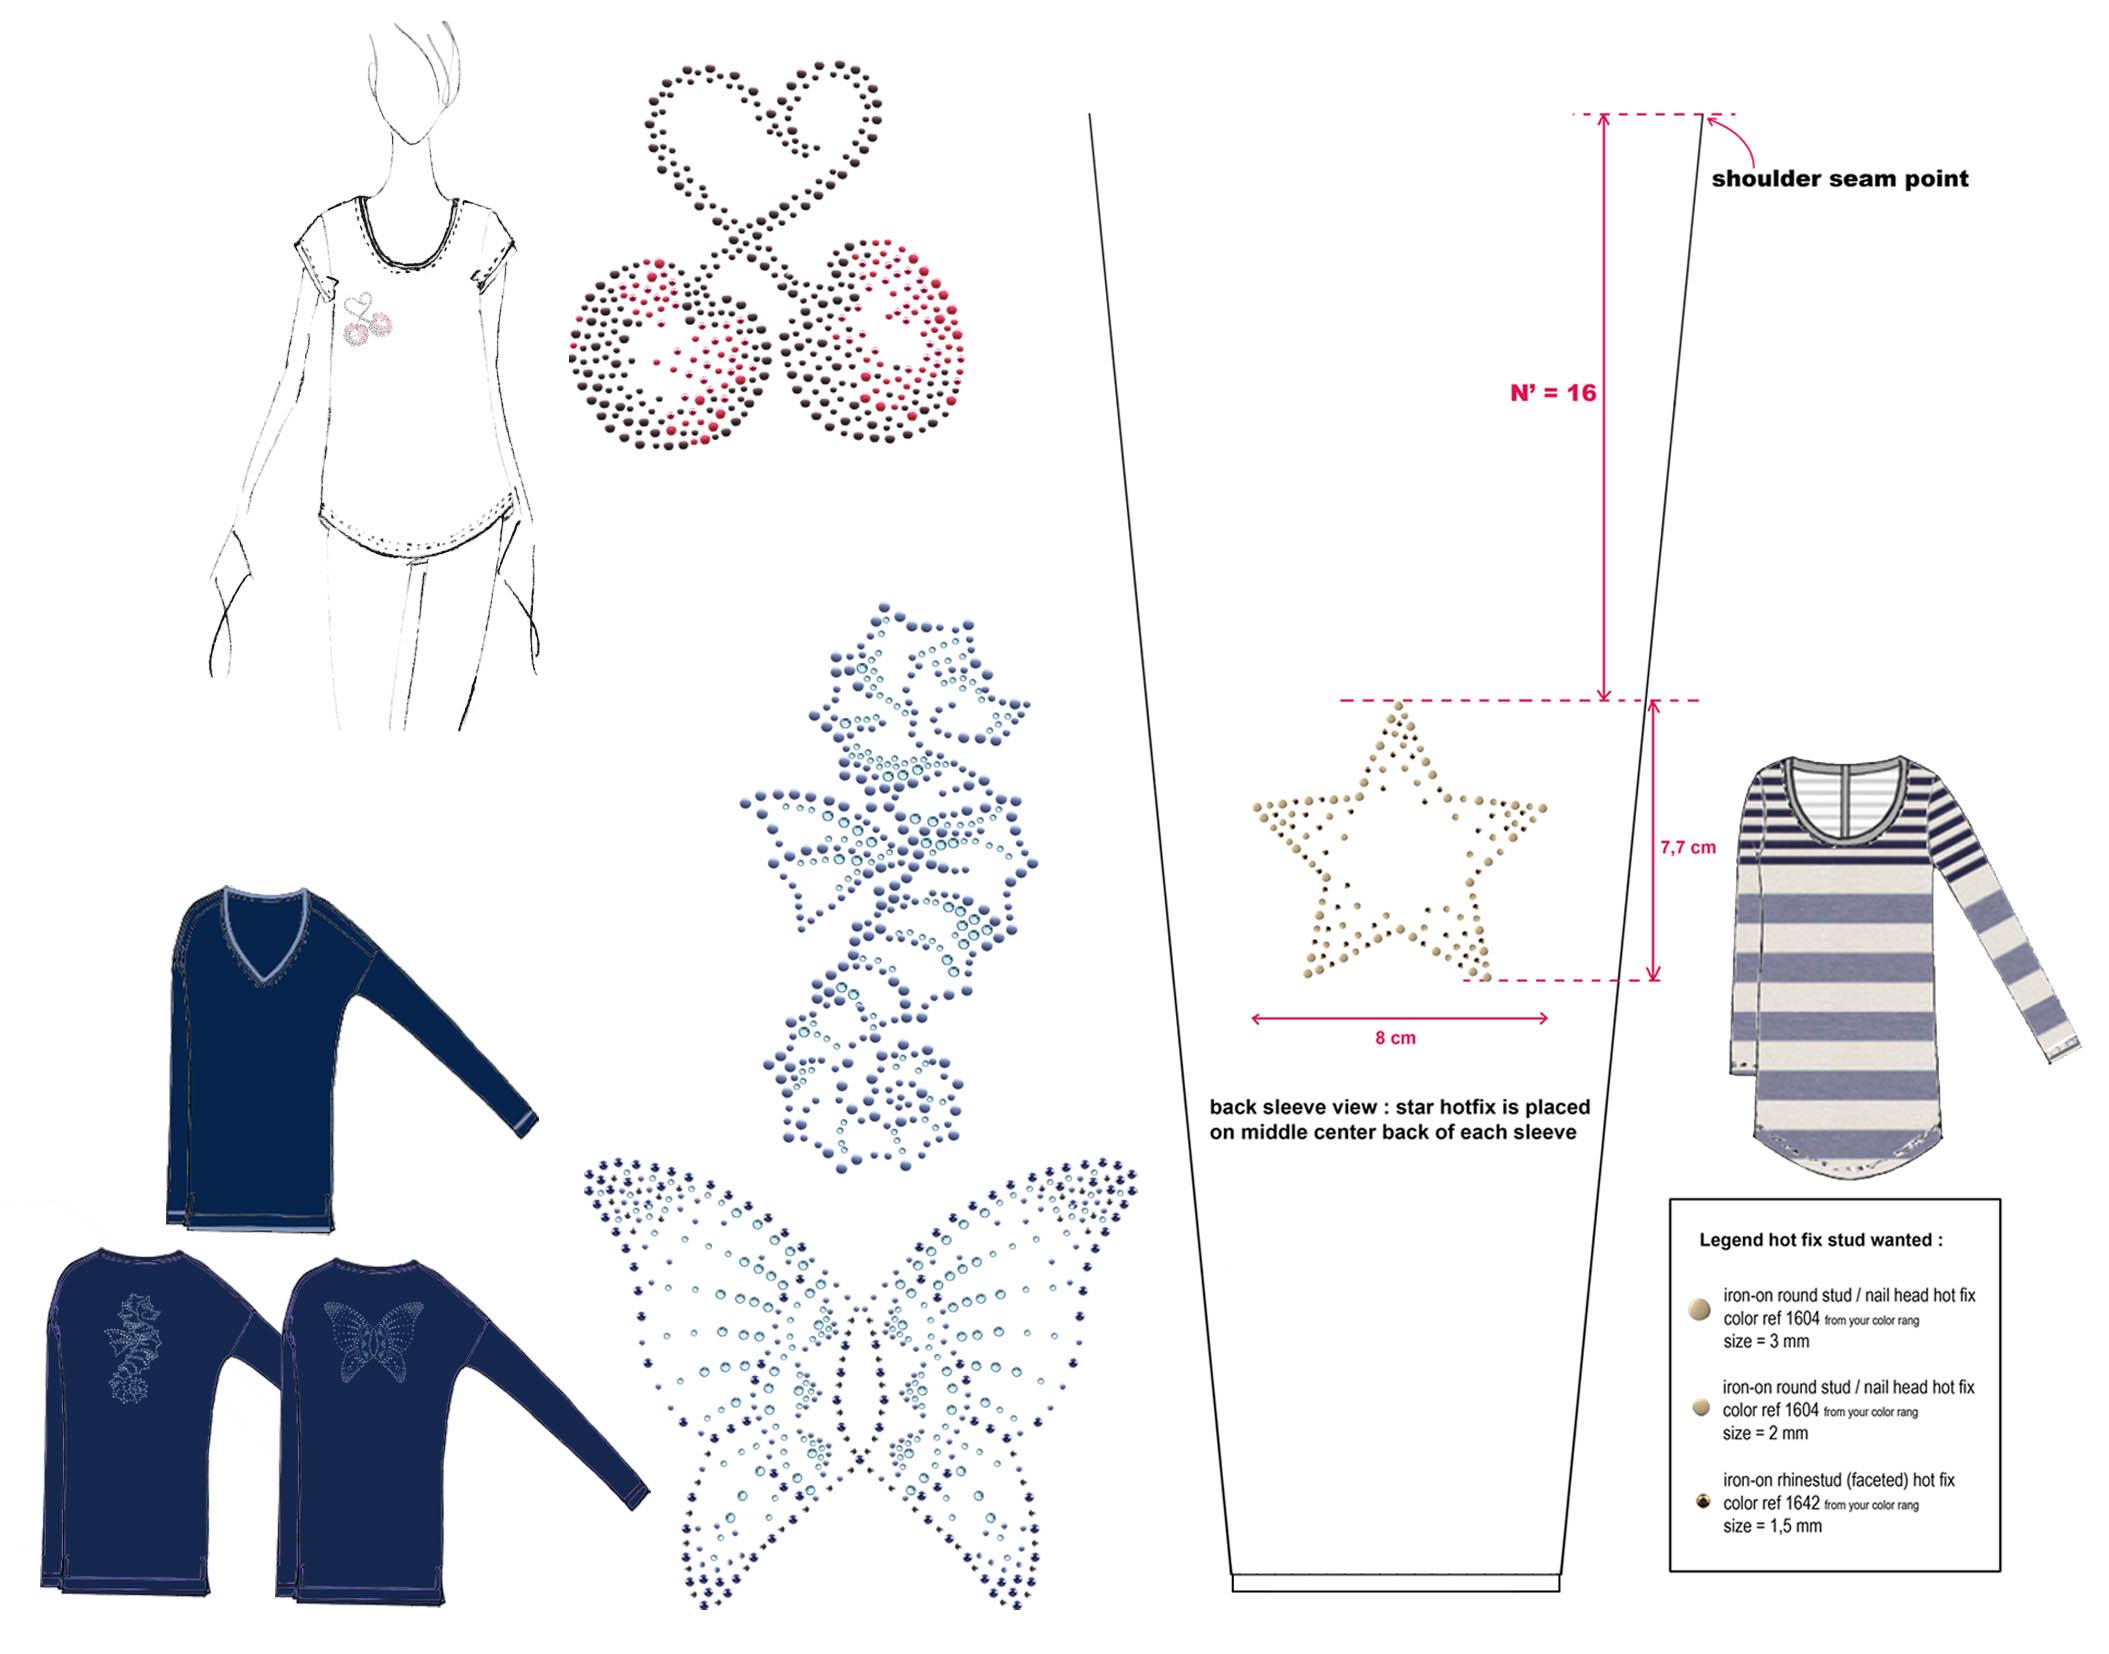 GERARD DAREL - summer 2013 - artwork creation & design placementtechnique: hot-fix appliqué